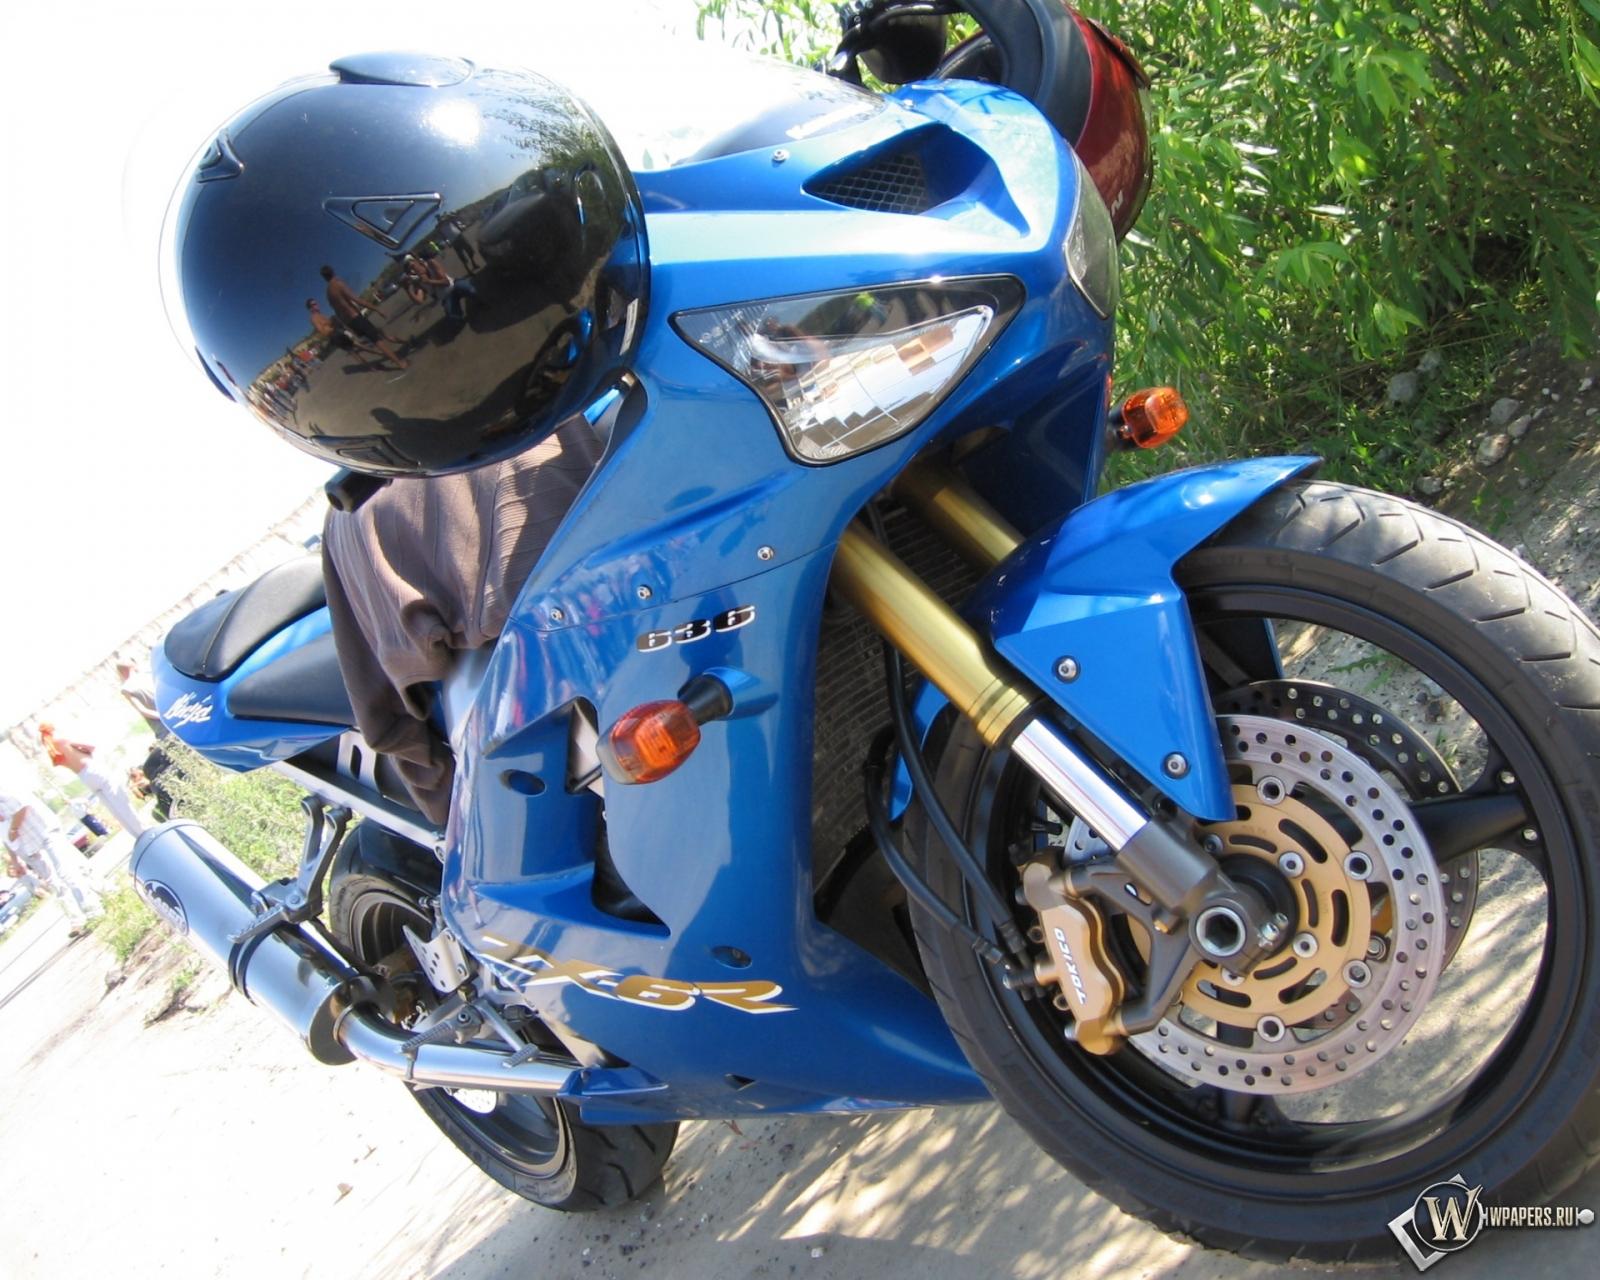 Kawasaki Ninja 1600x1280